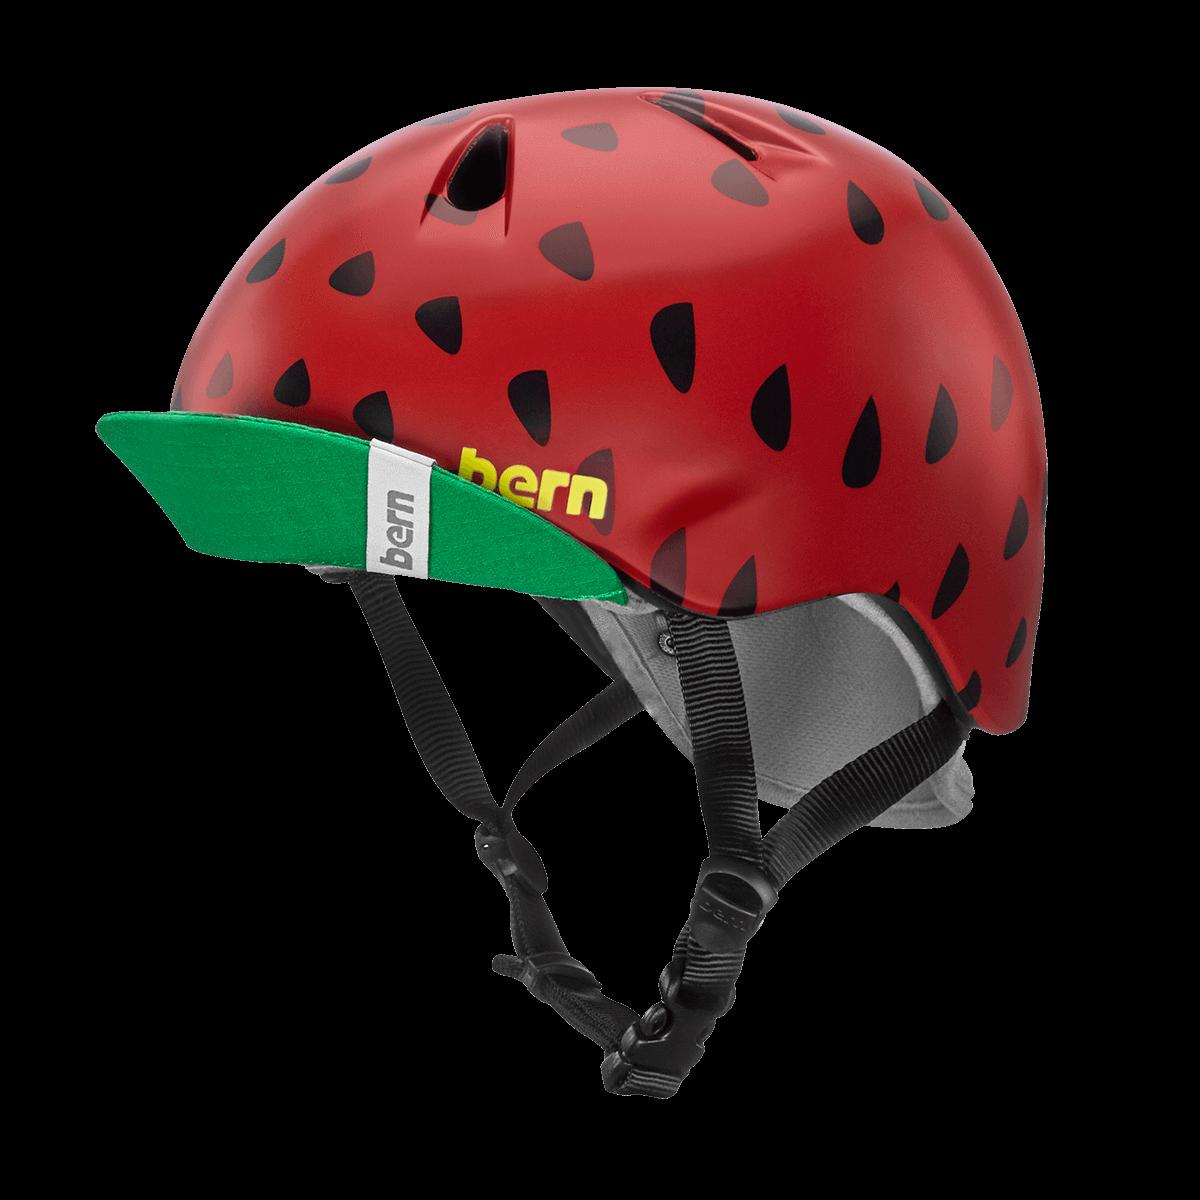 Casque Bern Nina-Satin-Red-Strawberry-Esprit vélo